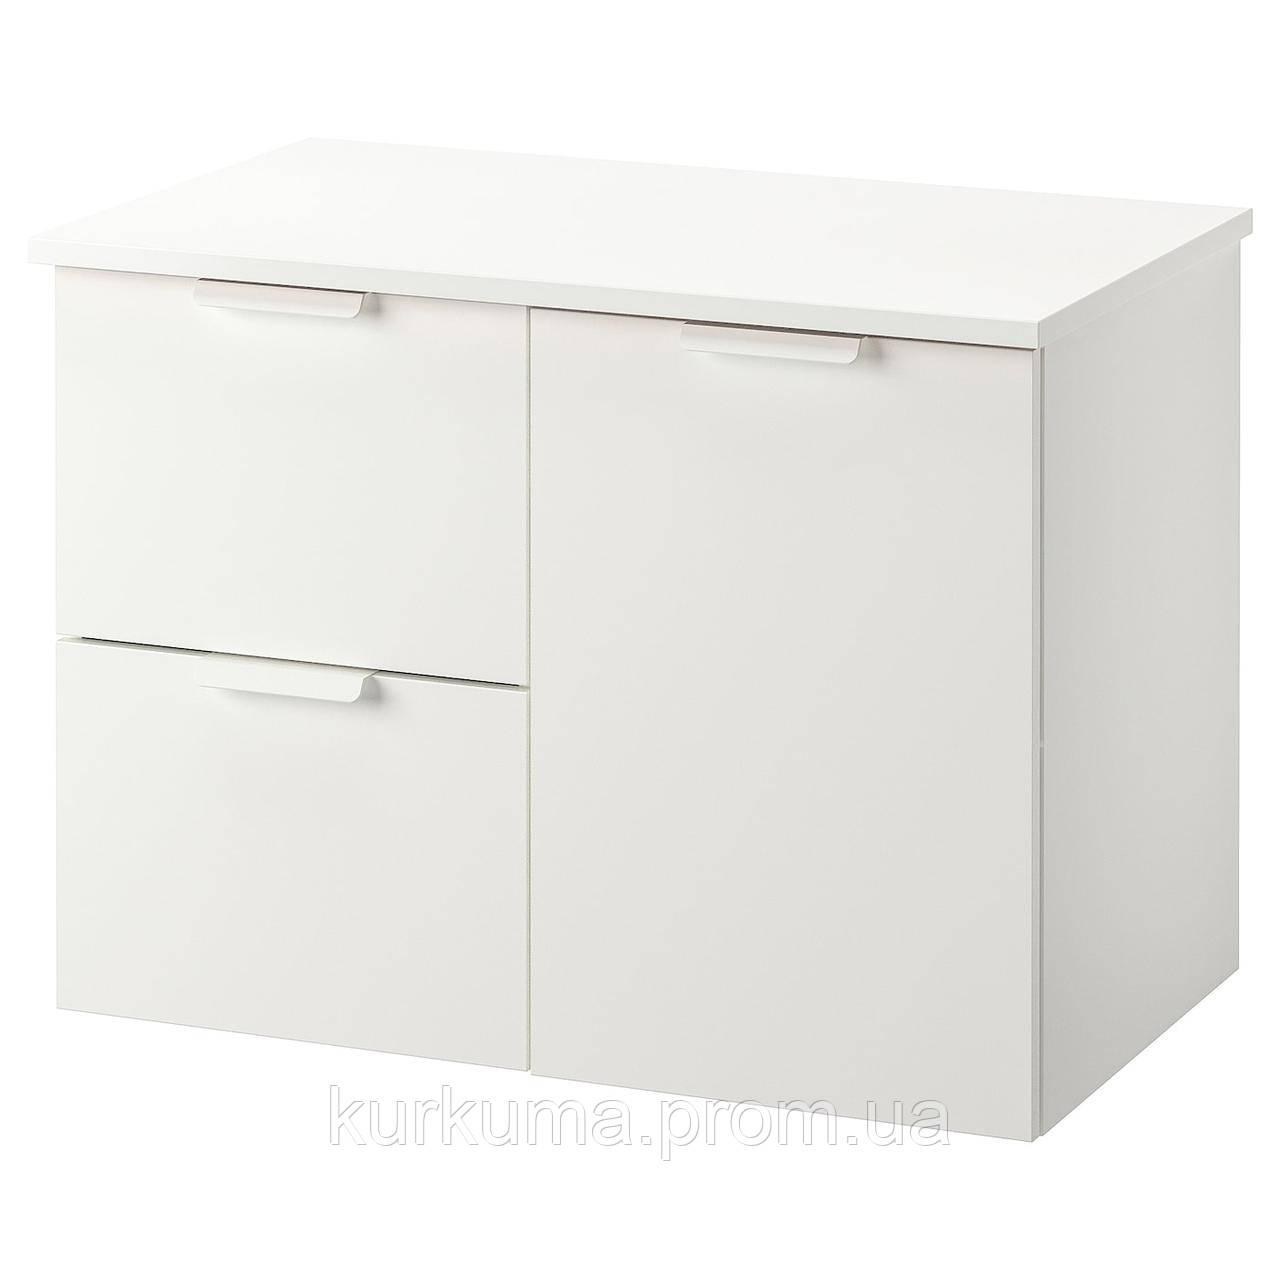 Шкаф под умывальник IKEA GODMORGON / TOLKEN (392.952.56)